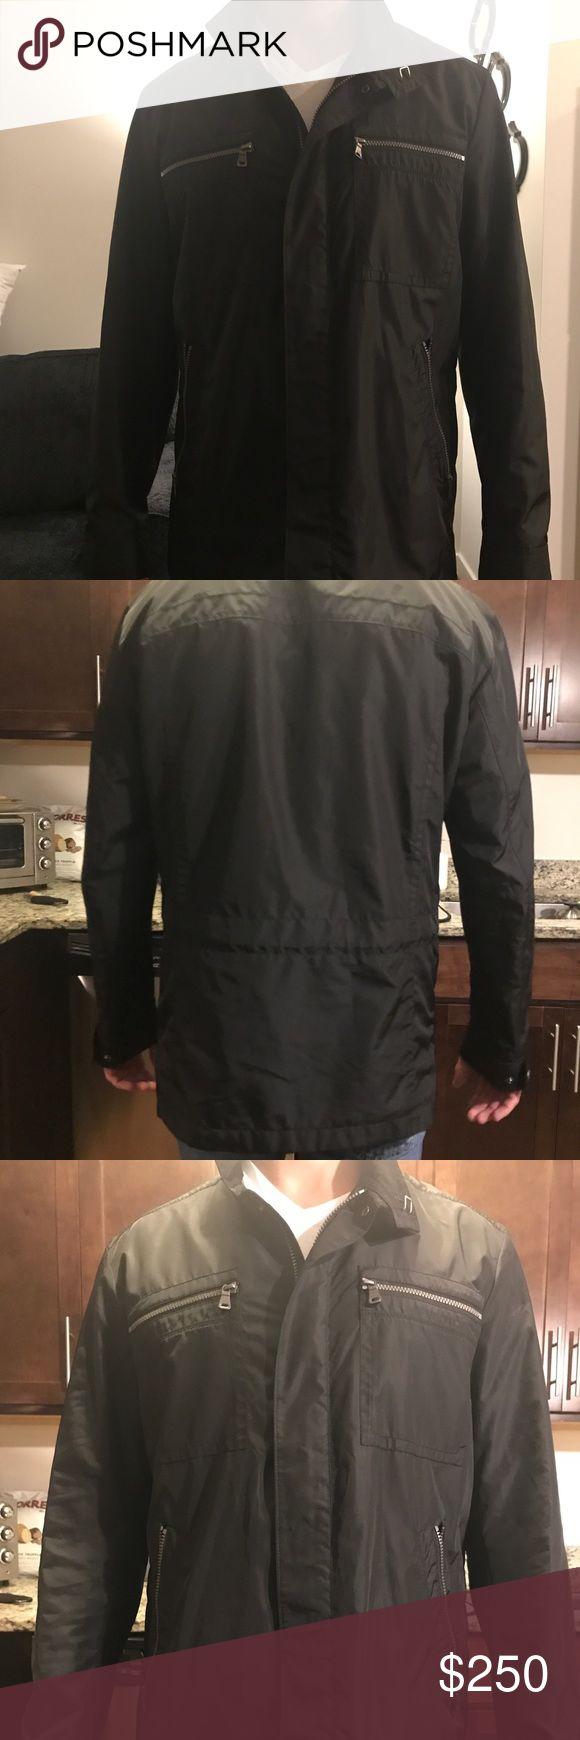 Men's Hugo Boss Black Raincoat Men's Hugo Boss Black Raincoat. Size large. New without tags, two inside zipper pockets Hugo Boss Jackets & Coats Windbreakers